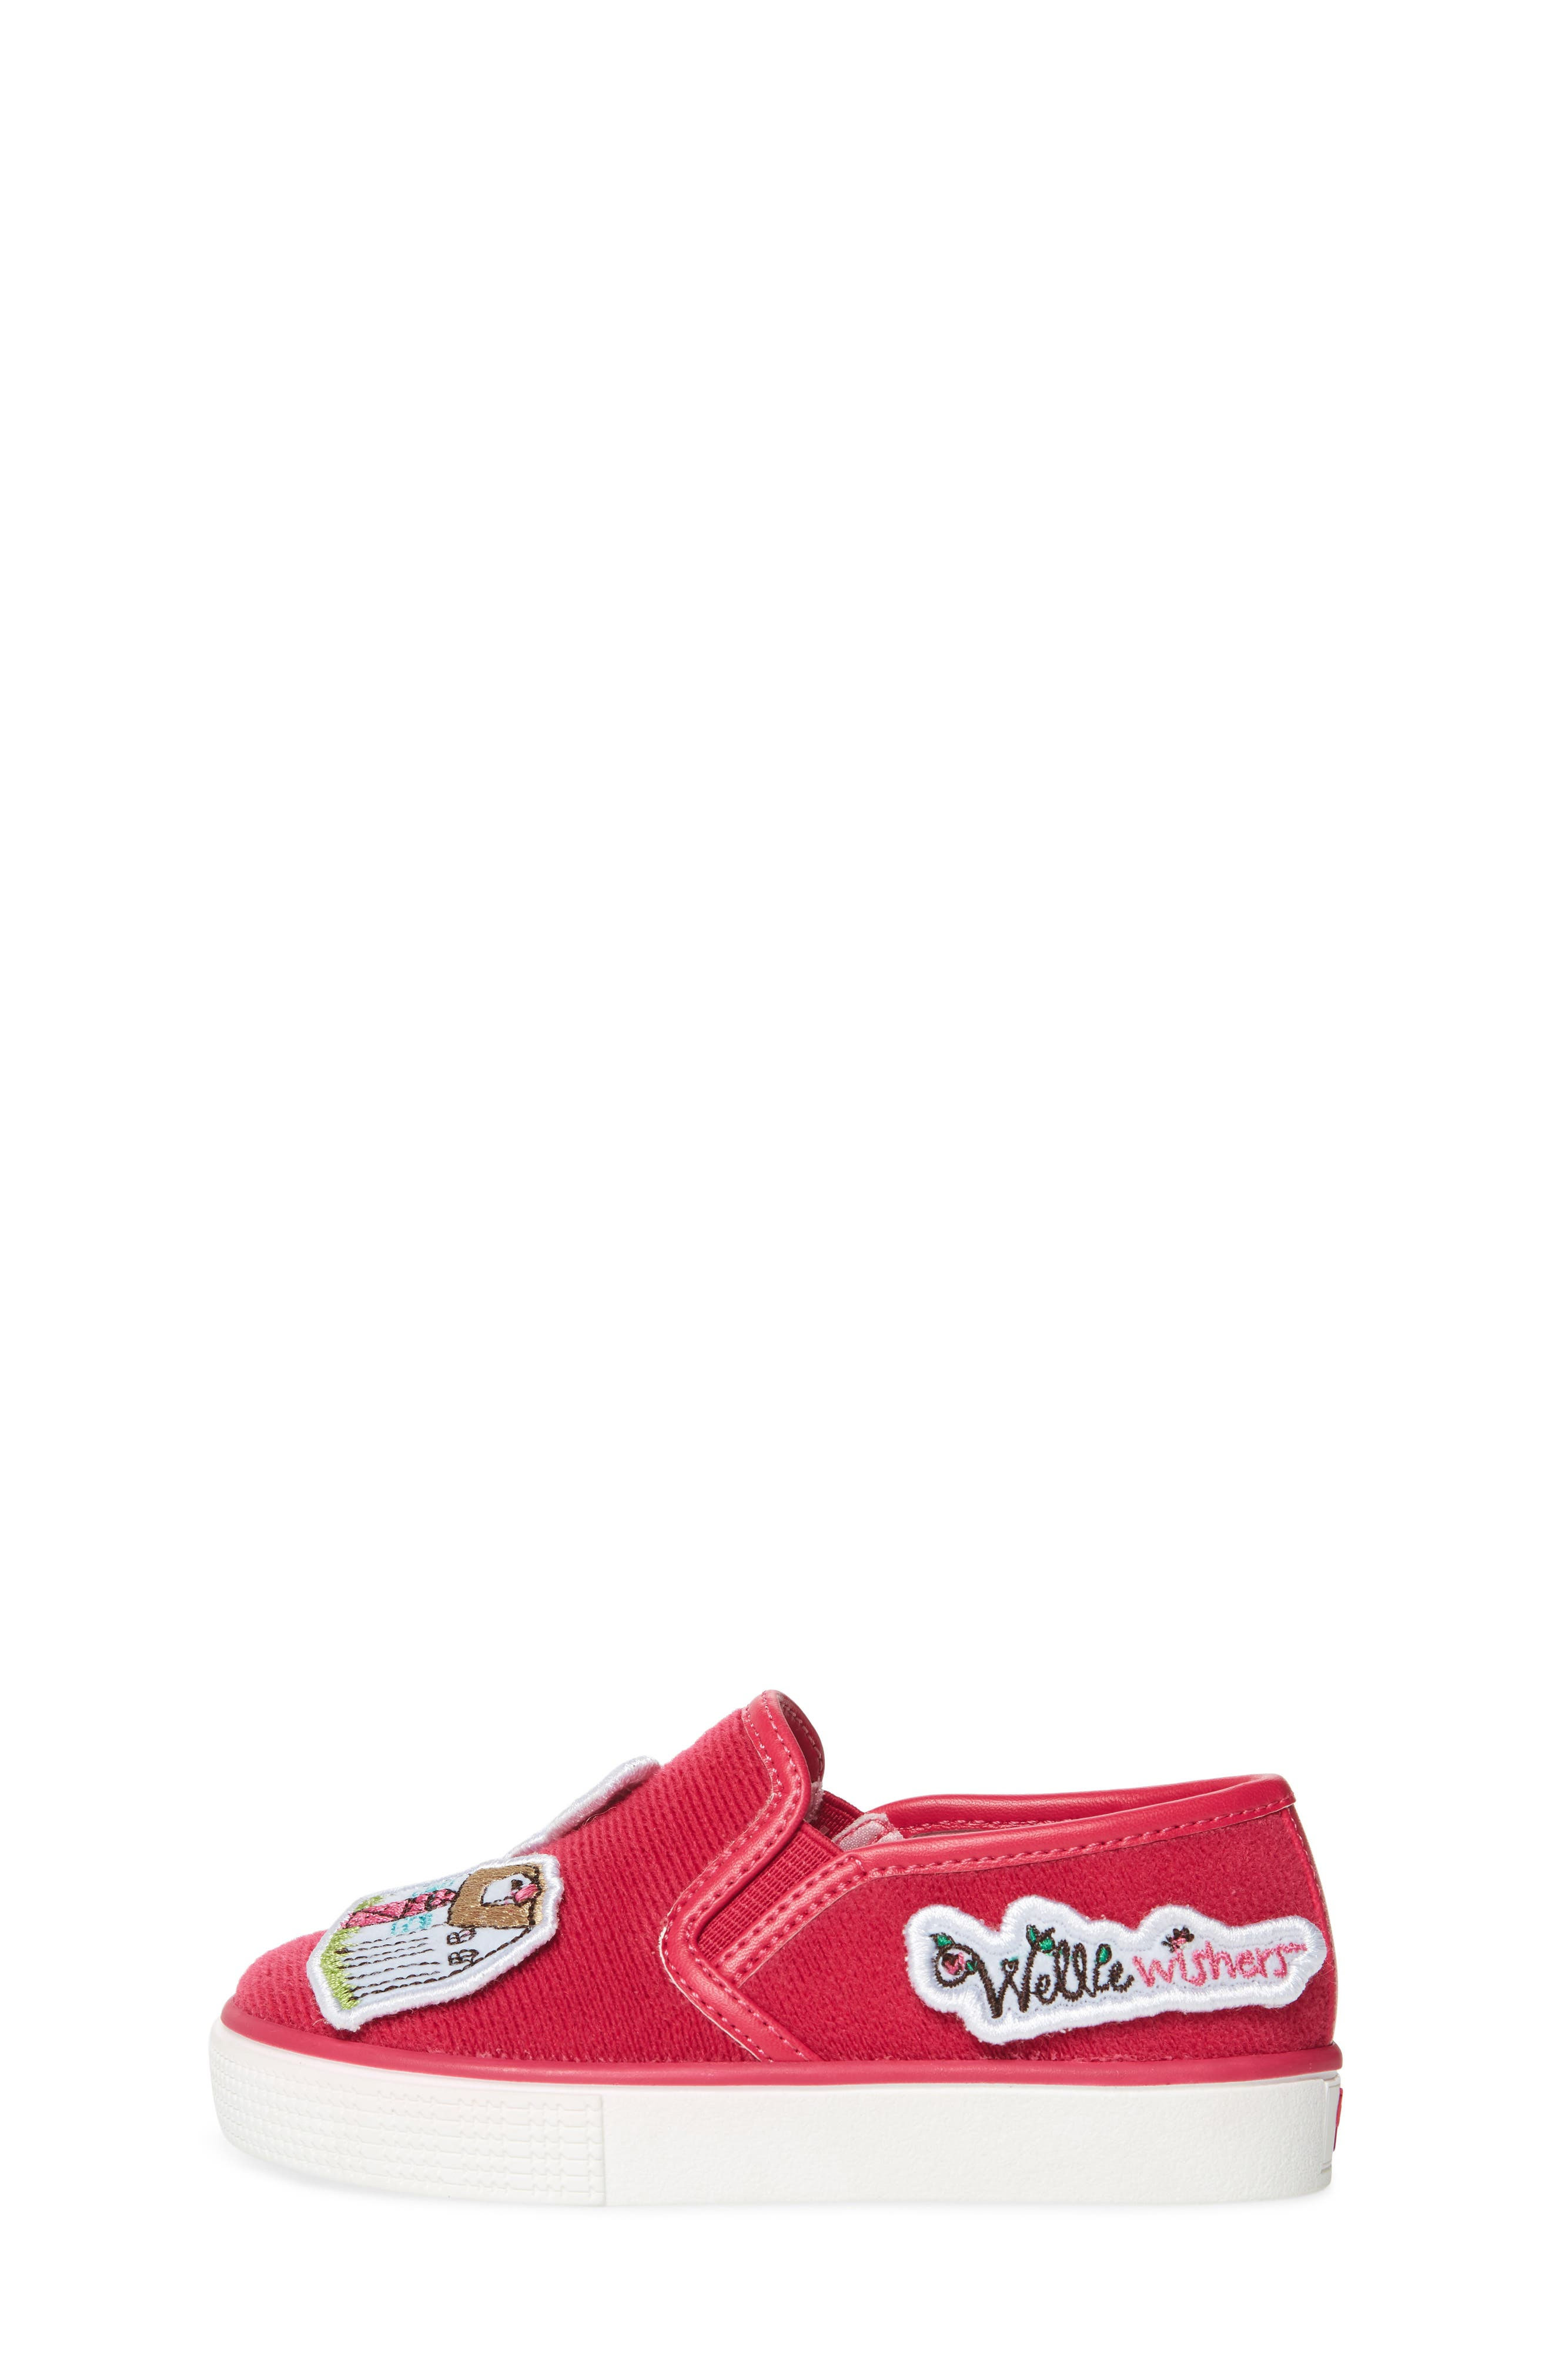 Patch Slip-On Sneaker,                             Alternate thumbnail 3, color,                             650